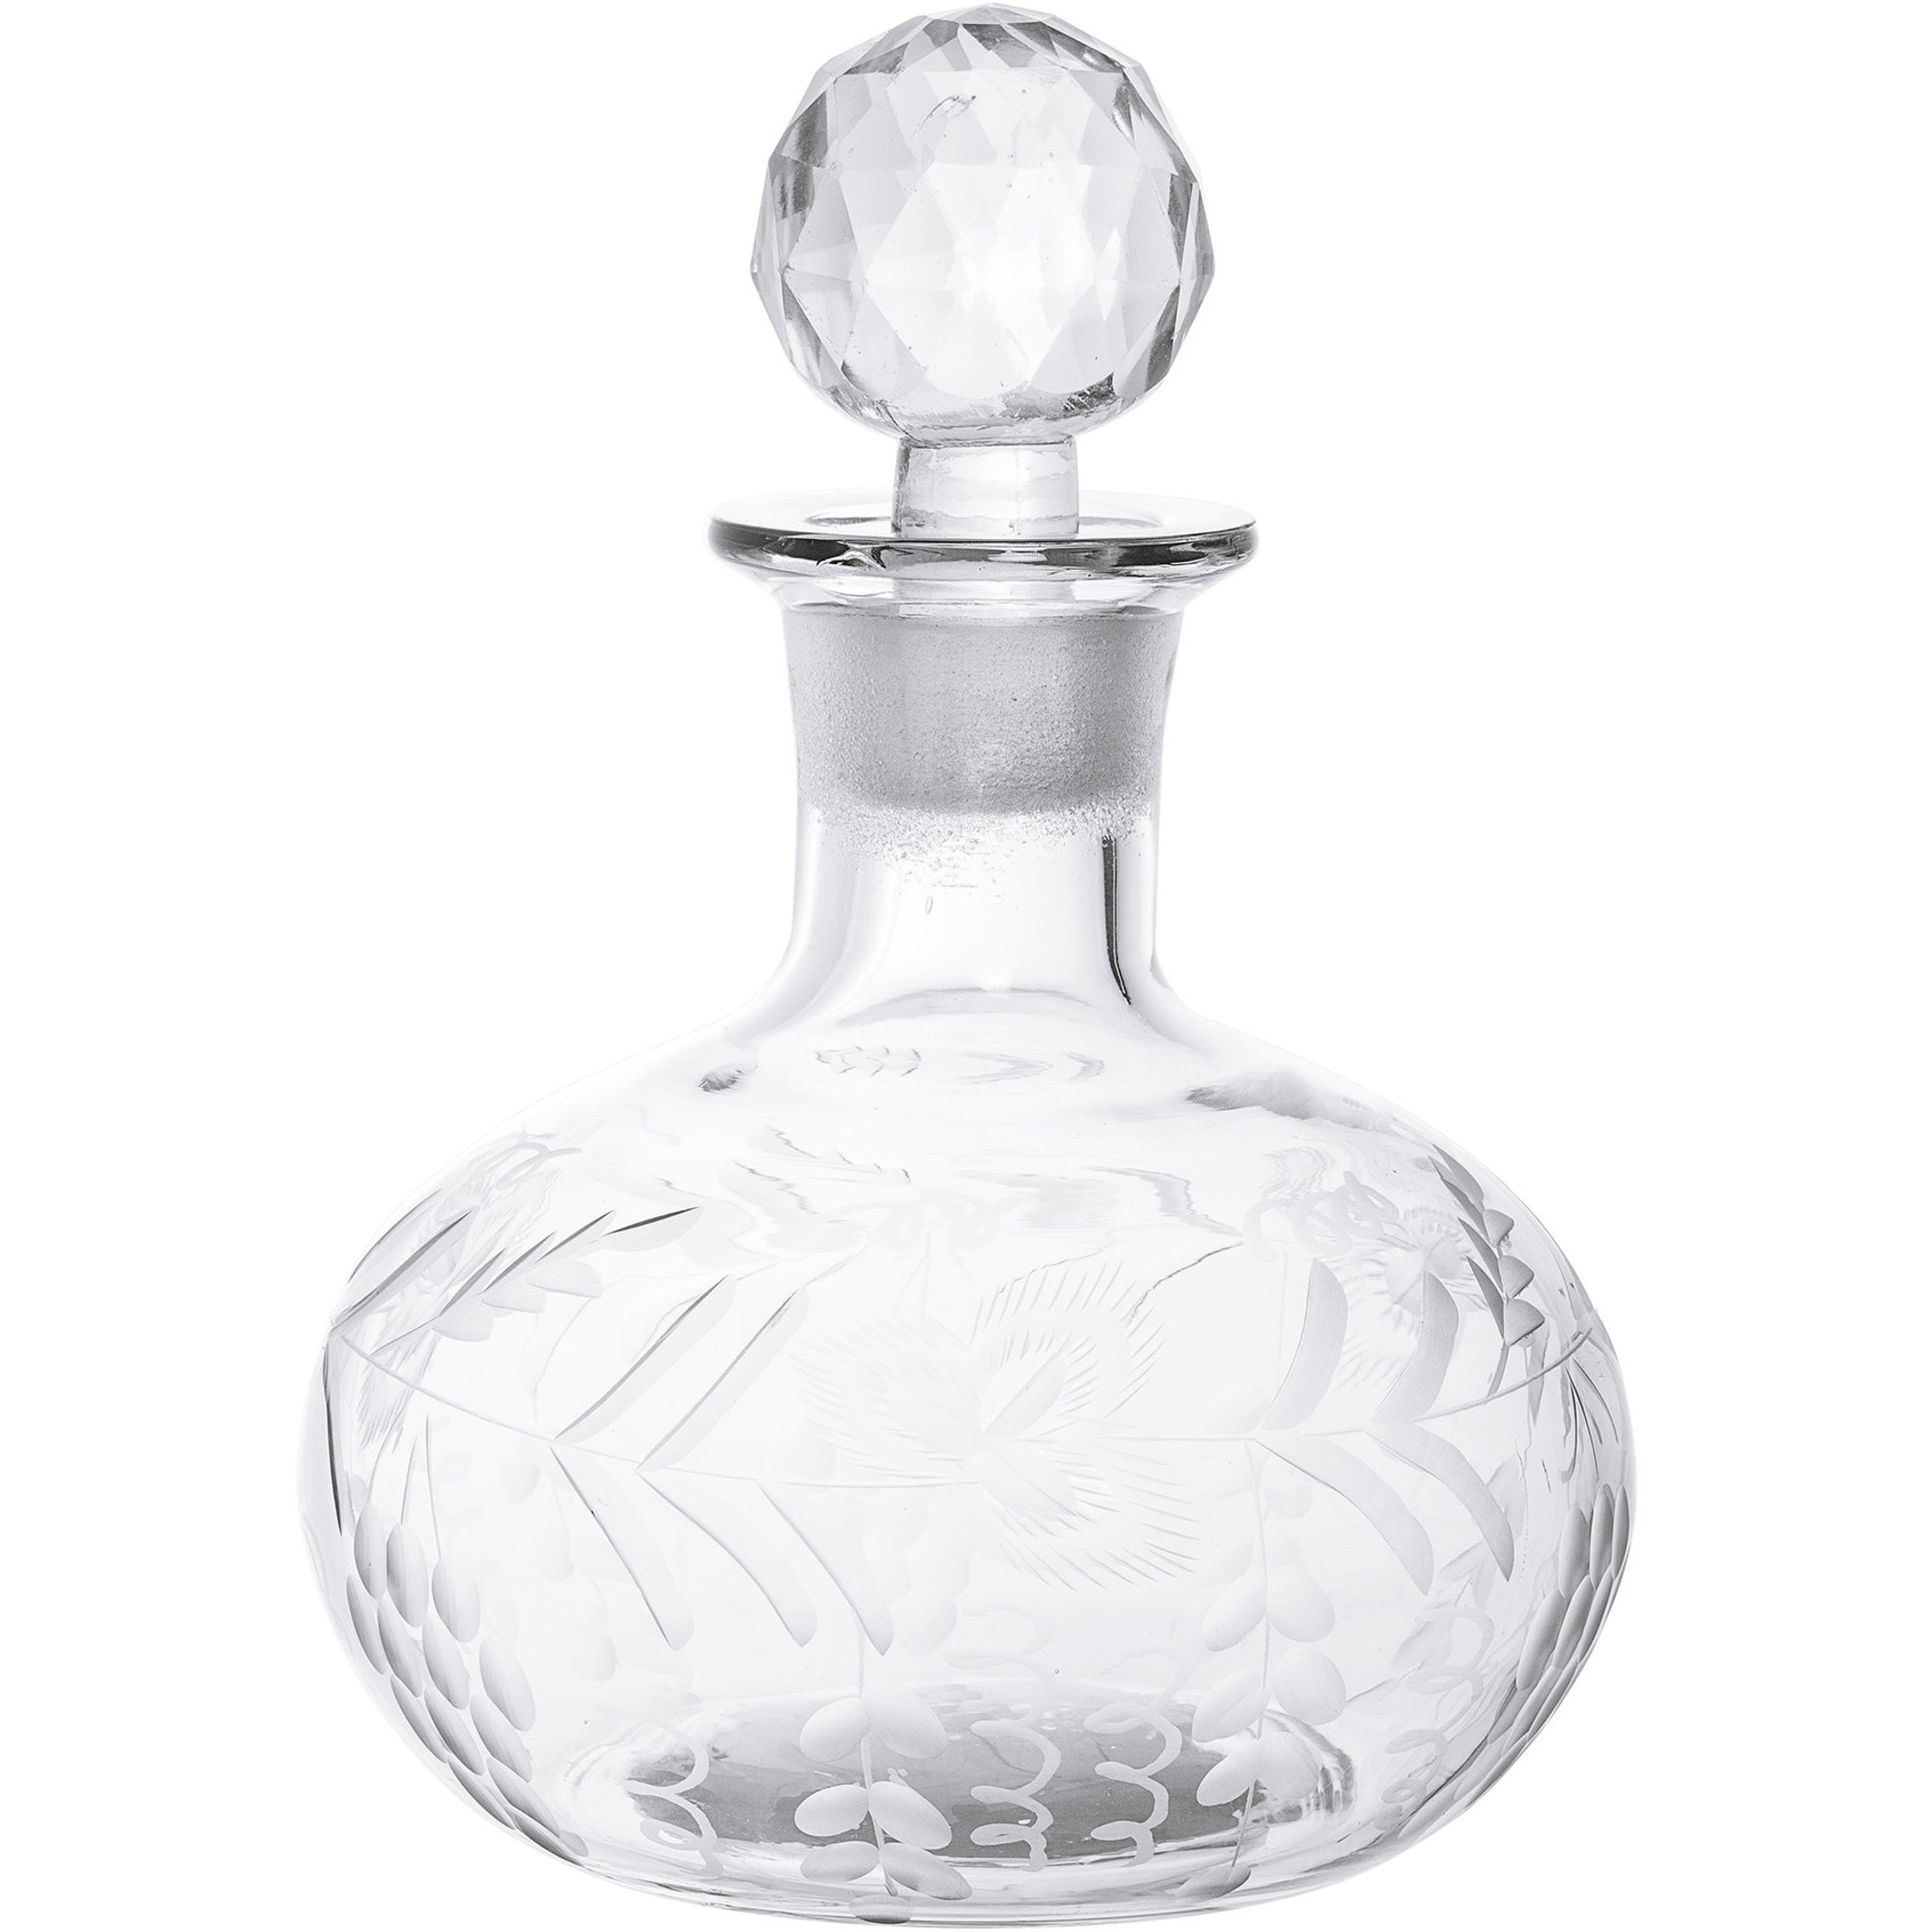 Bloomingville Glass KaraffelØ15 x H22 cm.